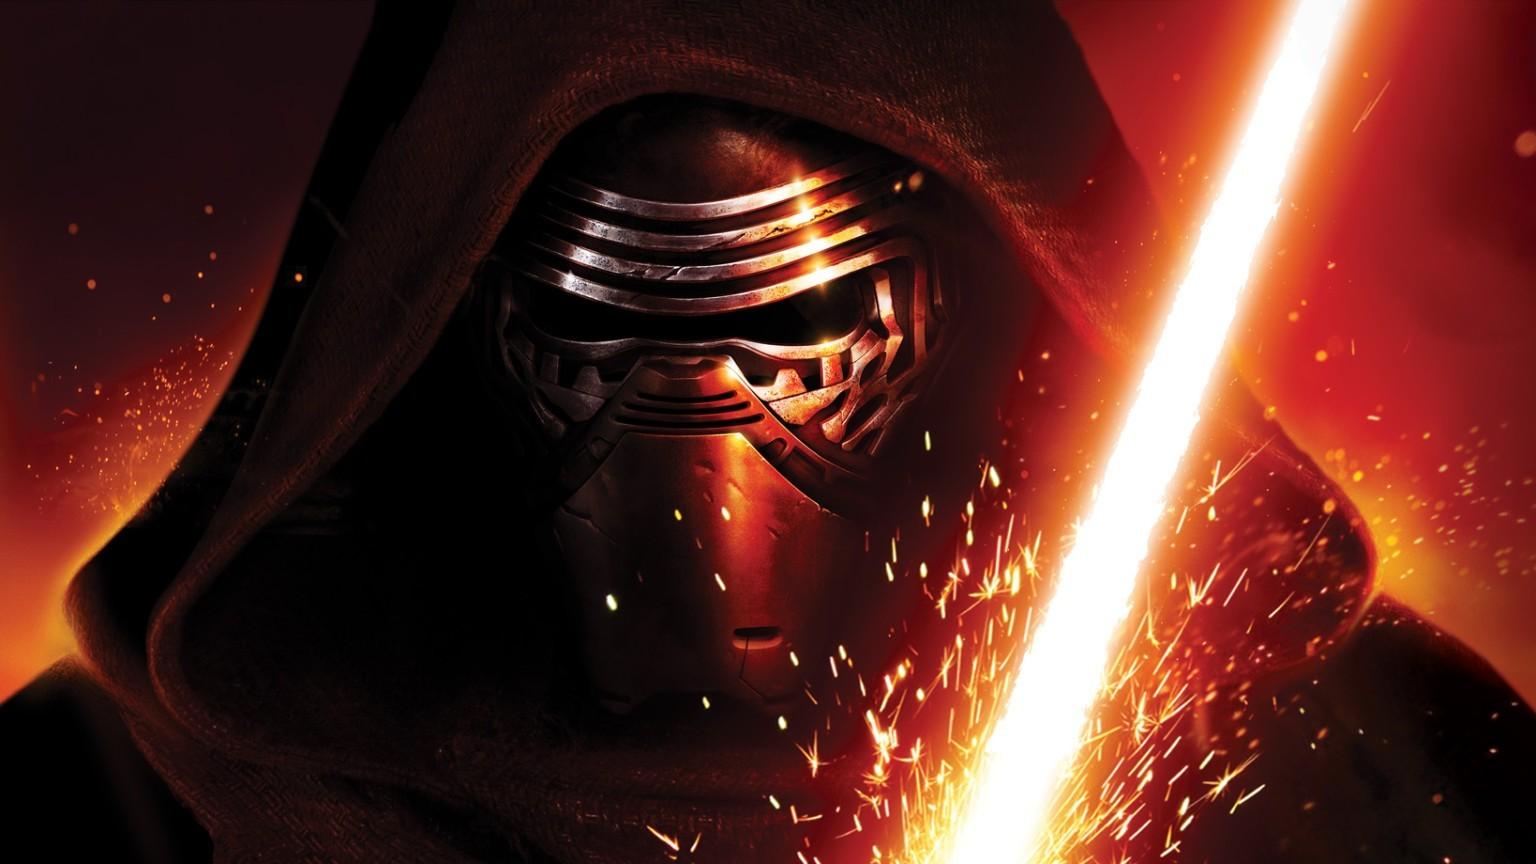 Wallpaper Star Wars Red Kylo Ren Light Flame Darkness